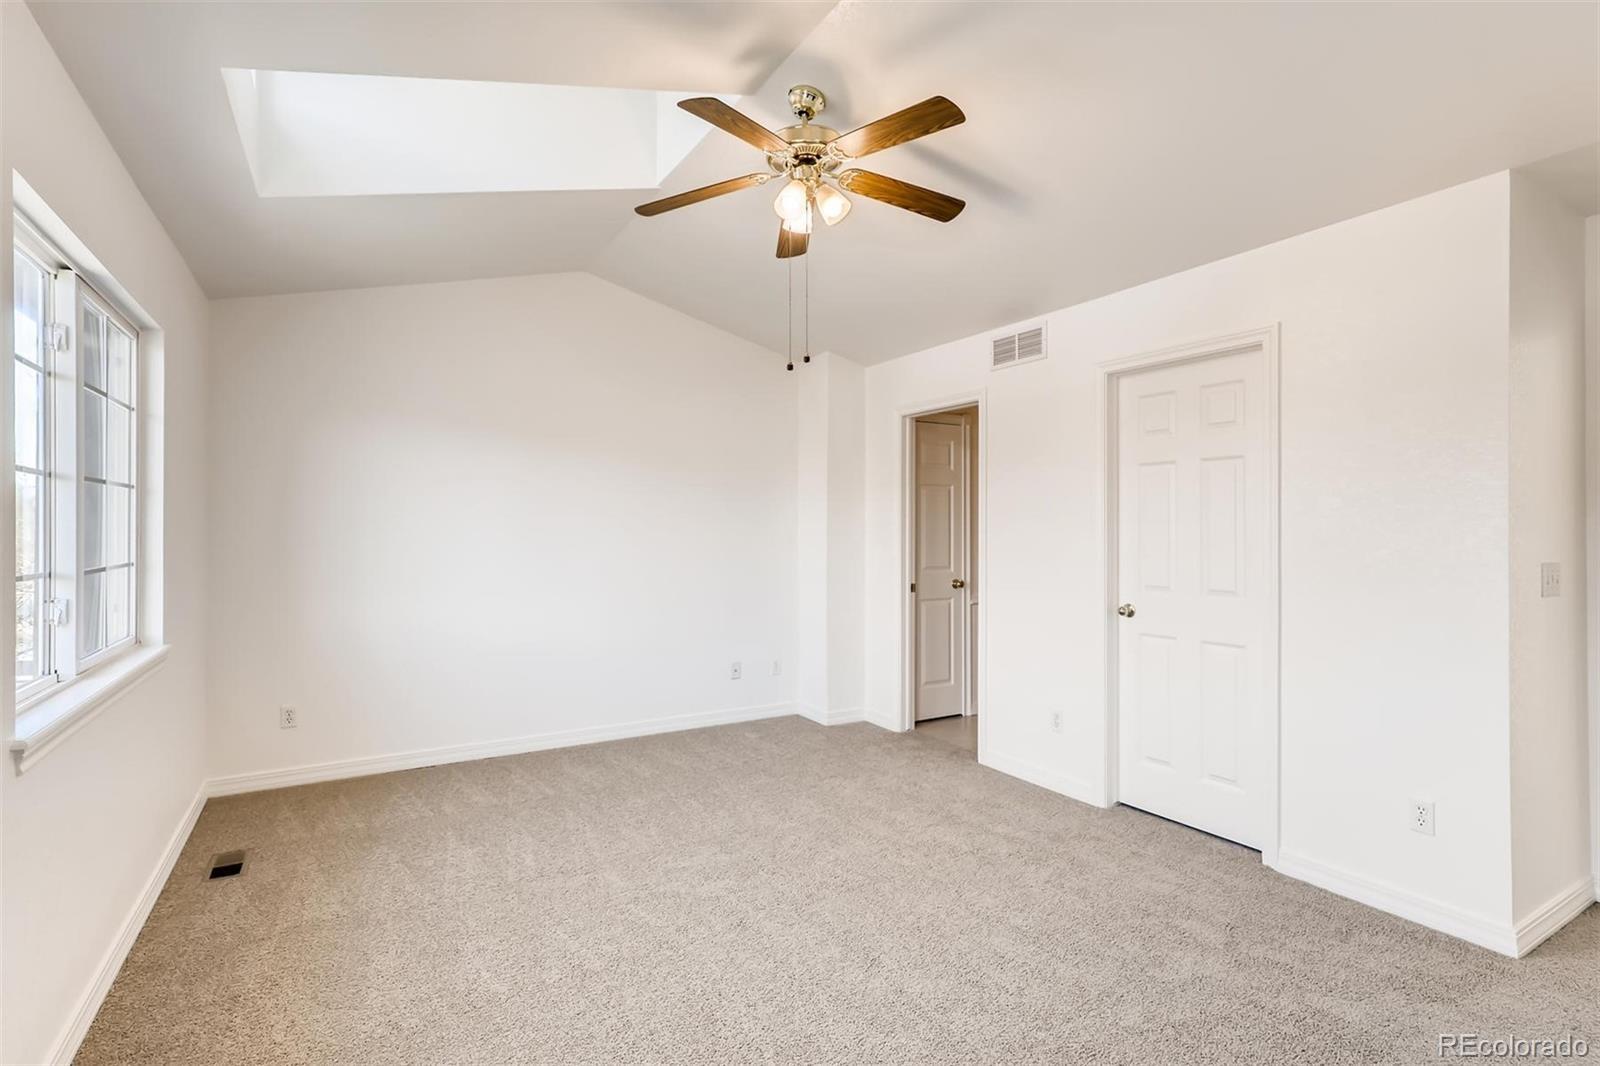 MLS# 7332667 - 15 - 1234 S Emery Street #H, Longmont, CO 80501